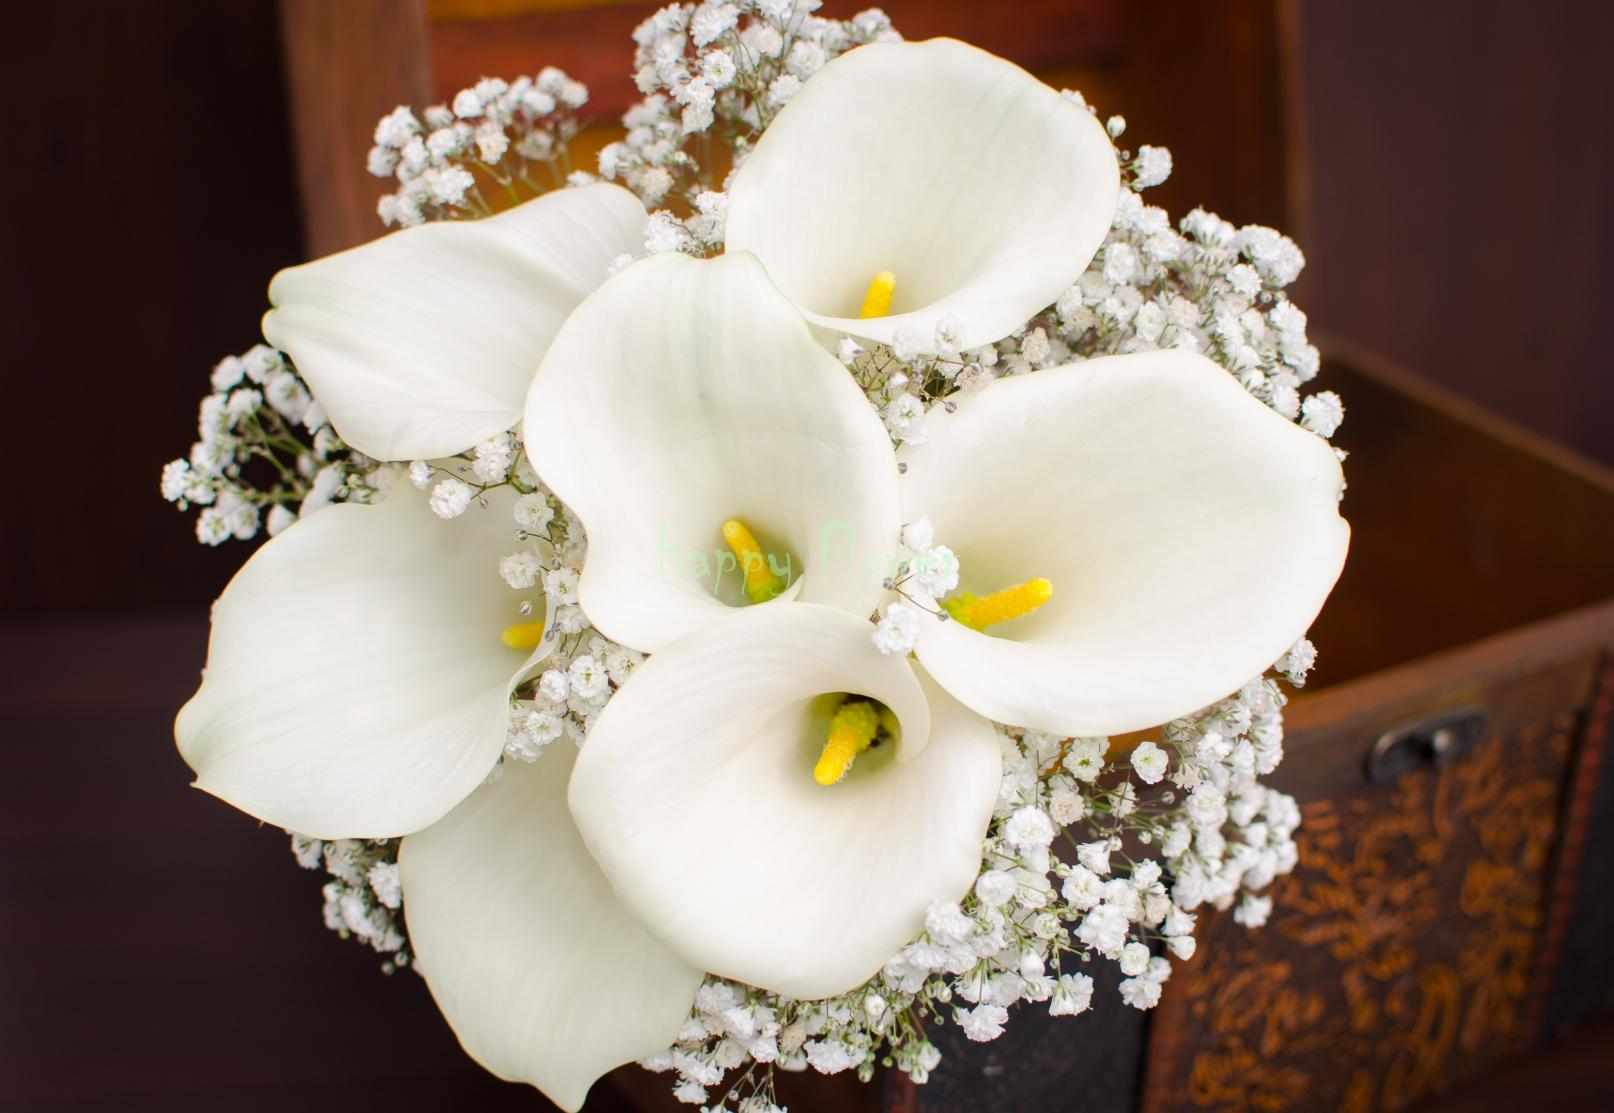 Buchet De Mireasa Cu 7 Cale Albe Si Floarea Miresei Happy Flower